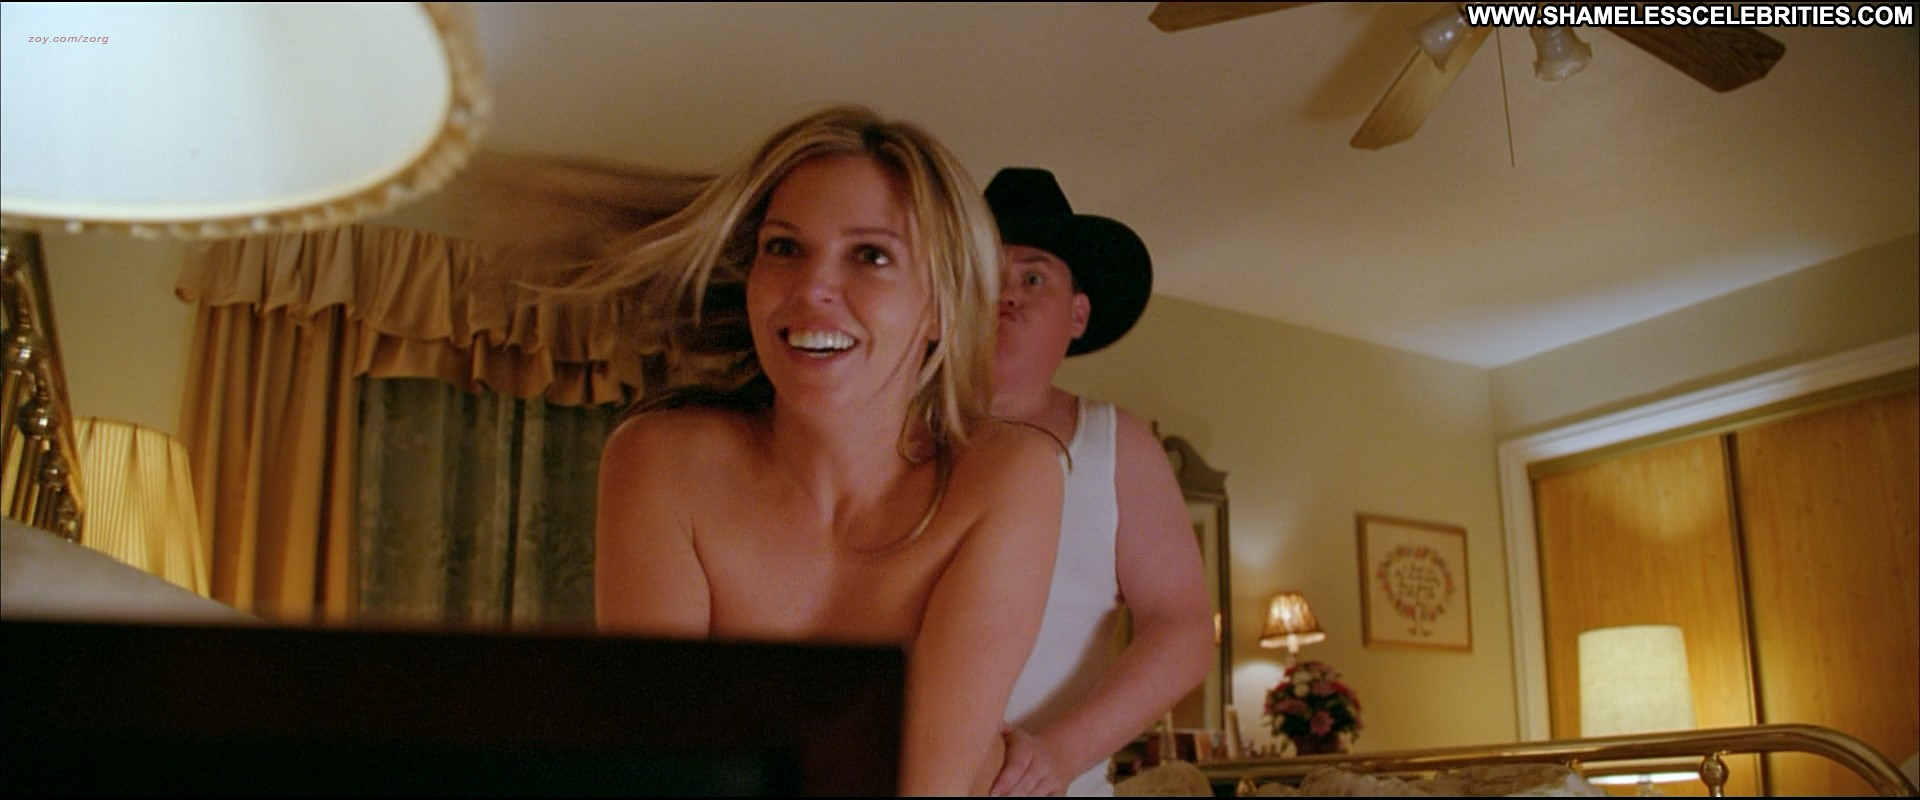 nicki minaj porno